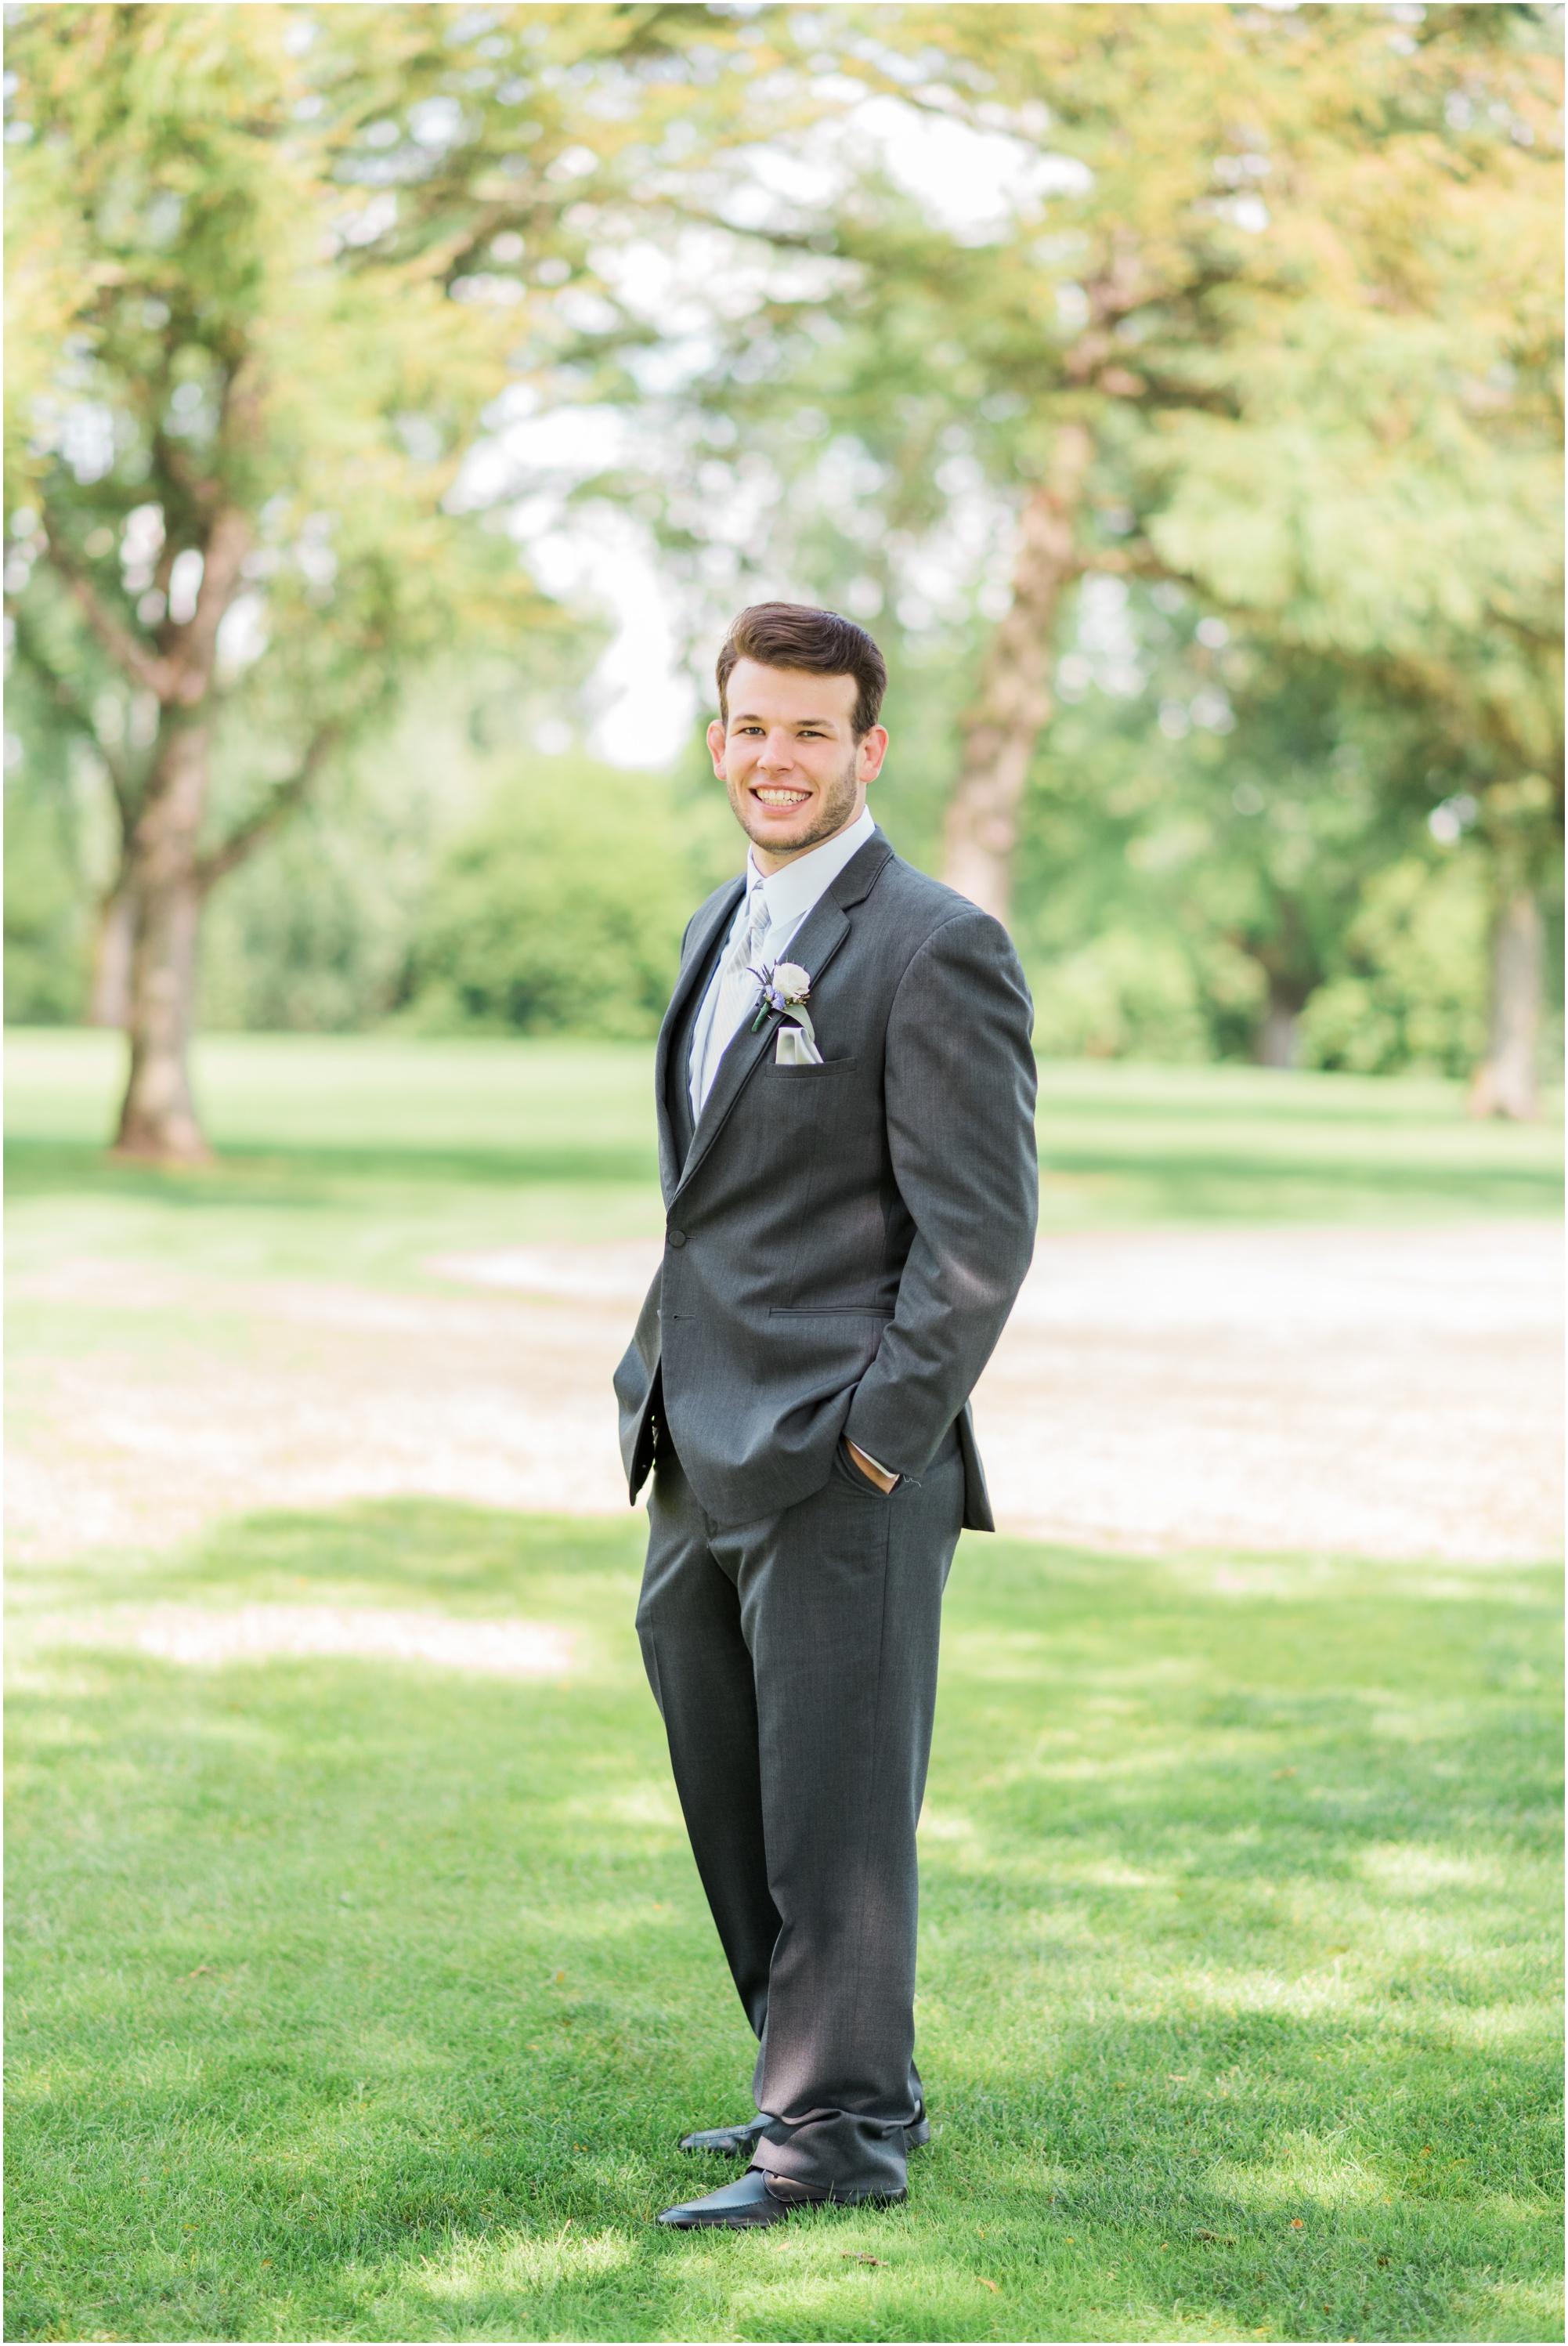 Wisconsin-Wedding-Photographer-Reedsburg-Country-Club-Kaela-and Matt-Wedding-121.jpg